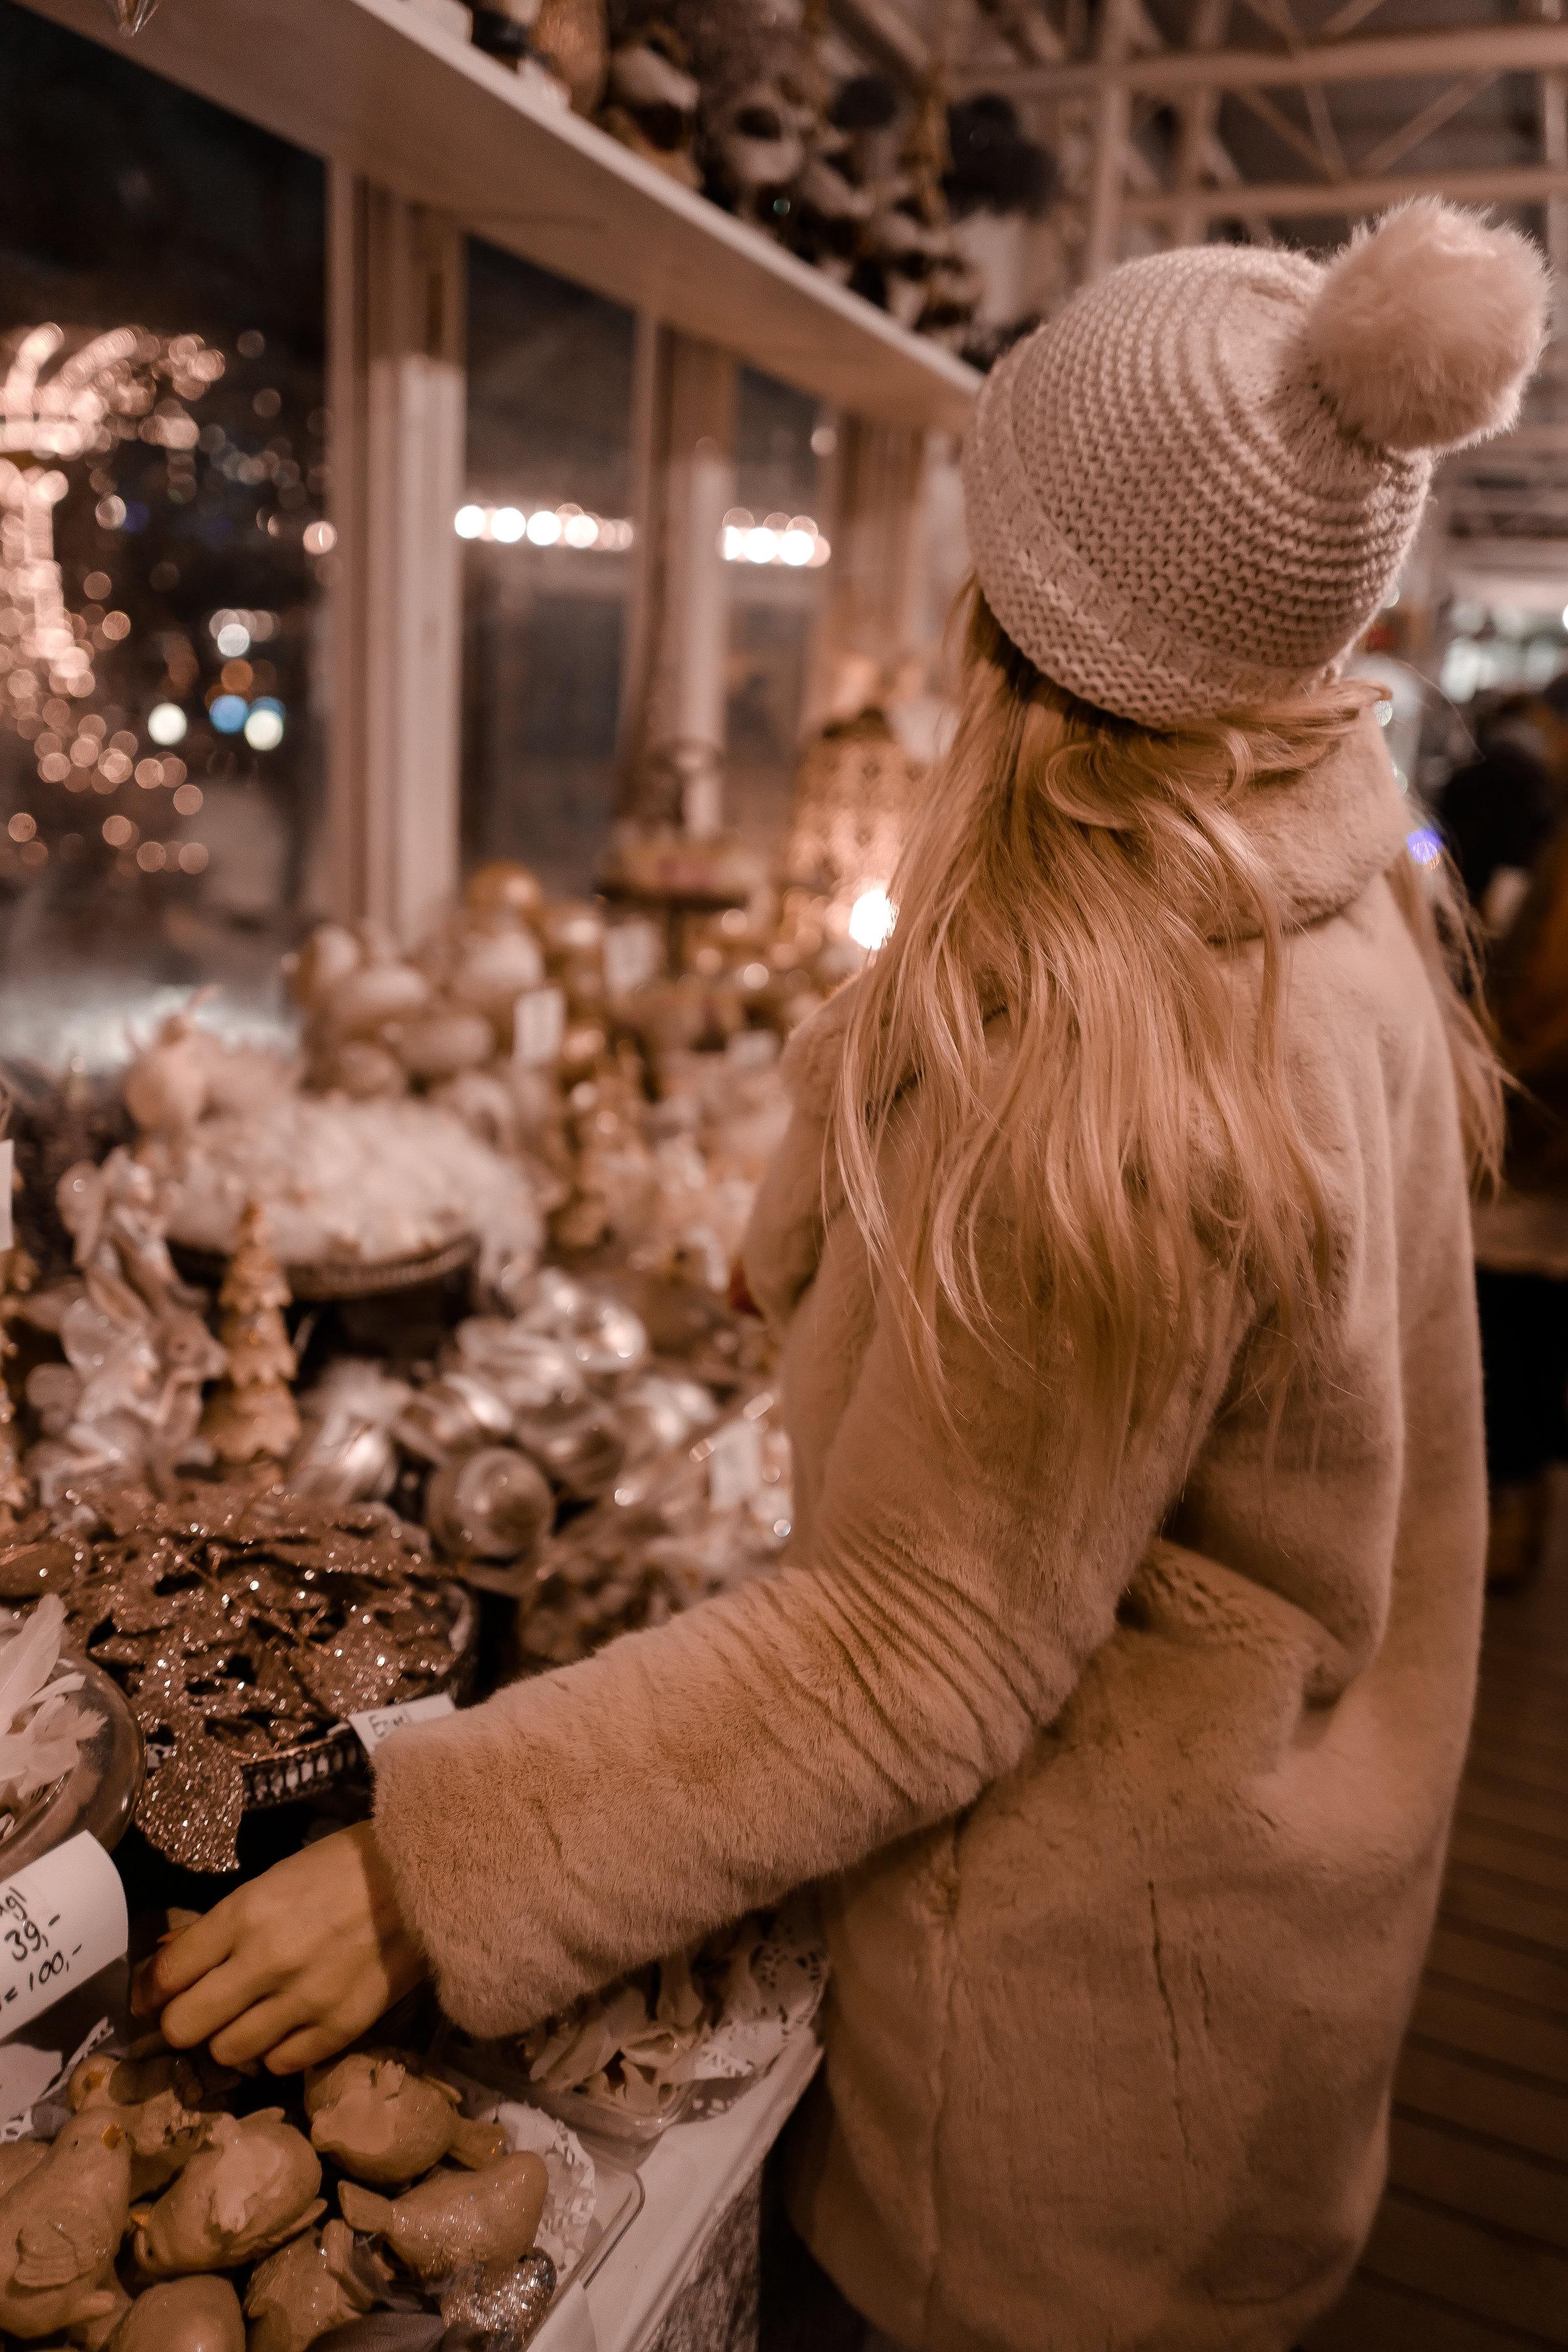 One of the many cute little shops inside The Tivoli Gardens